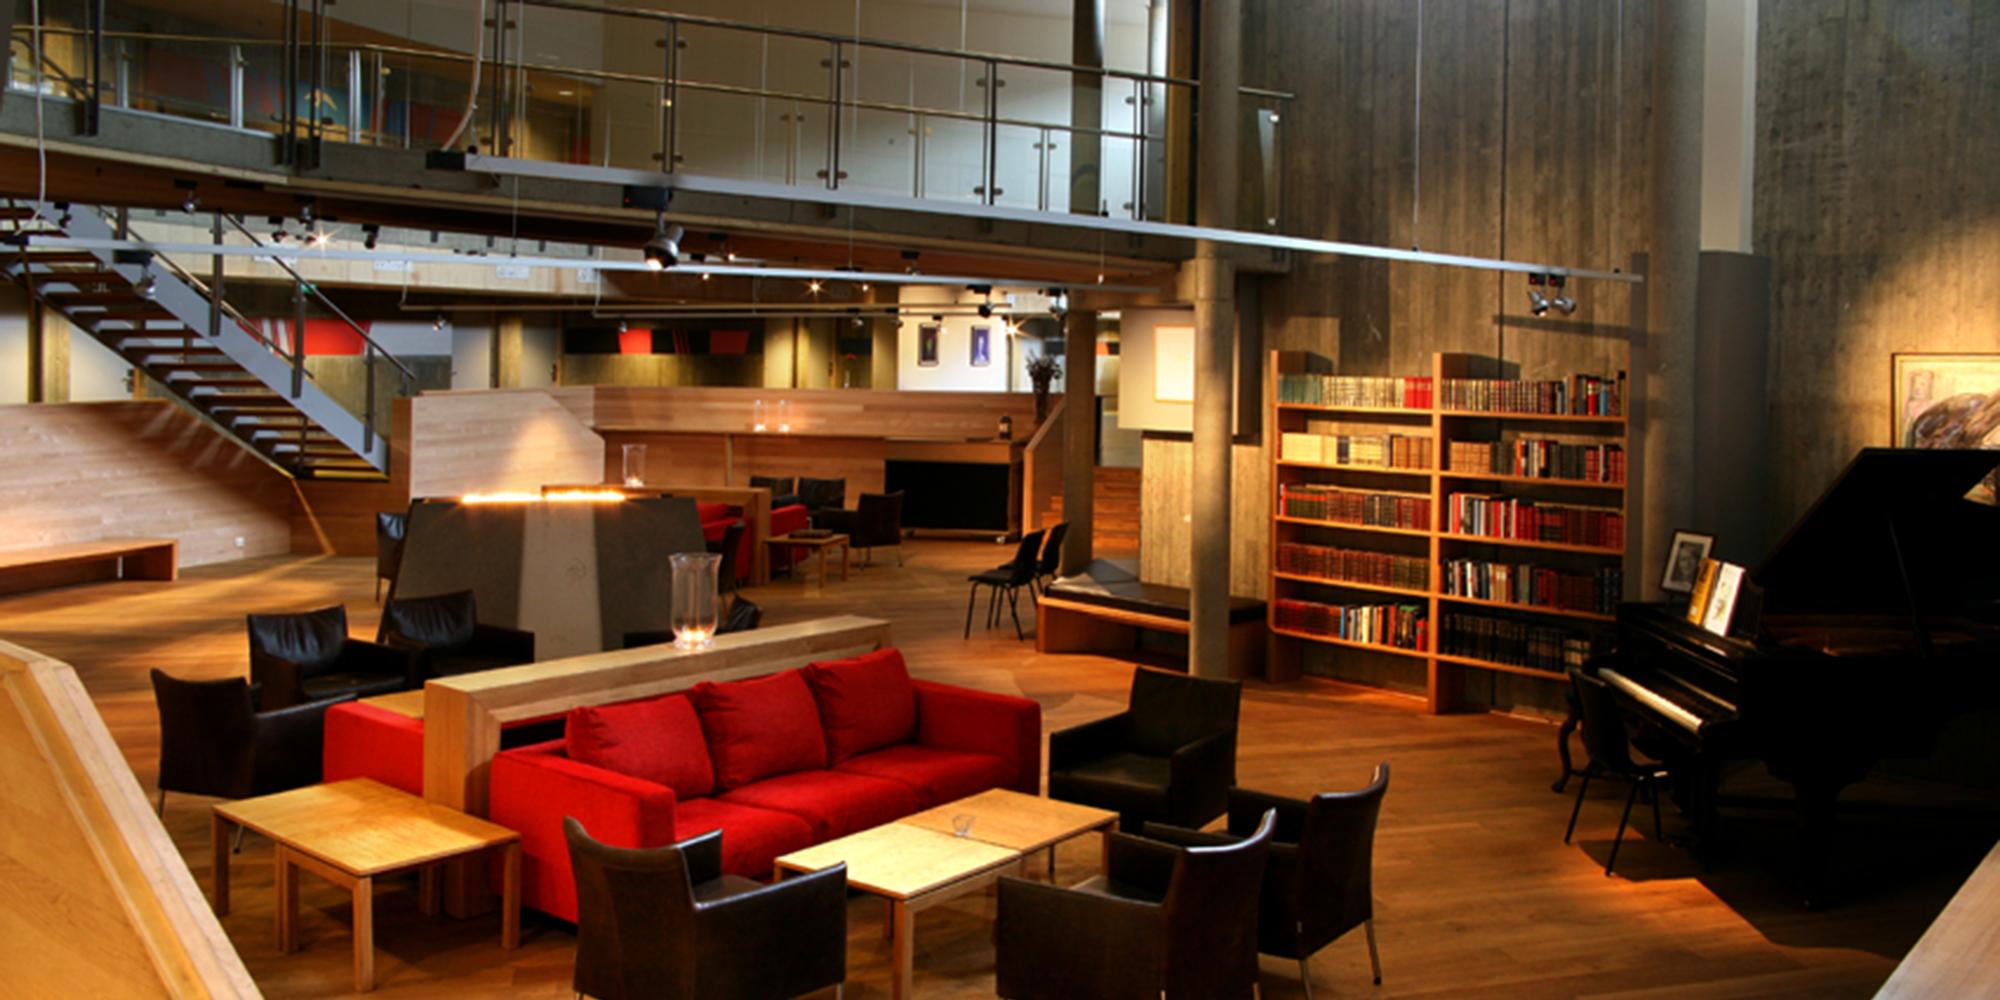 Stiklestad Hotell - The library. Copyright: Stiklestad Hotell